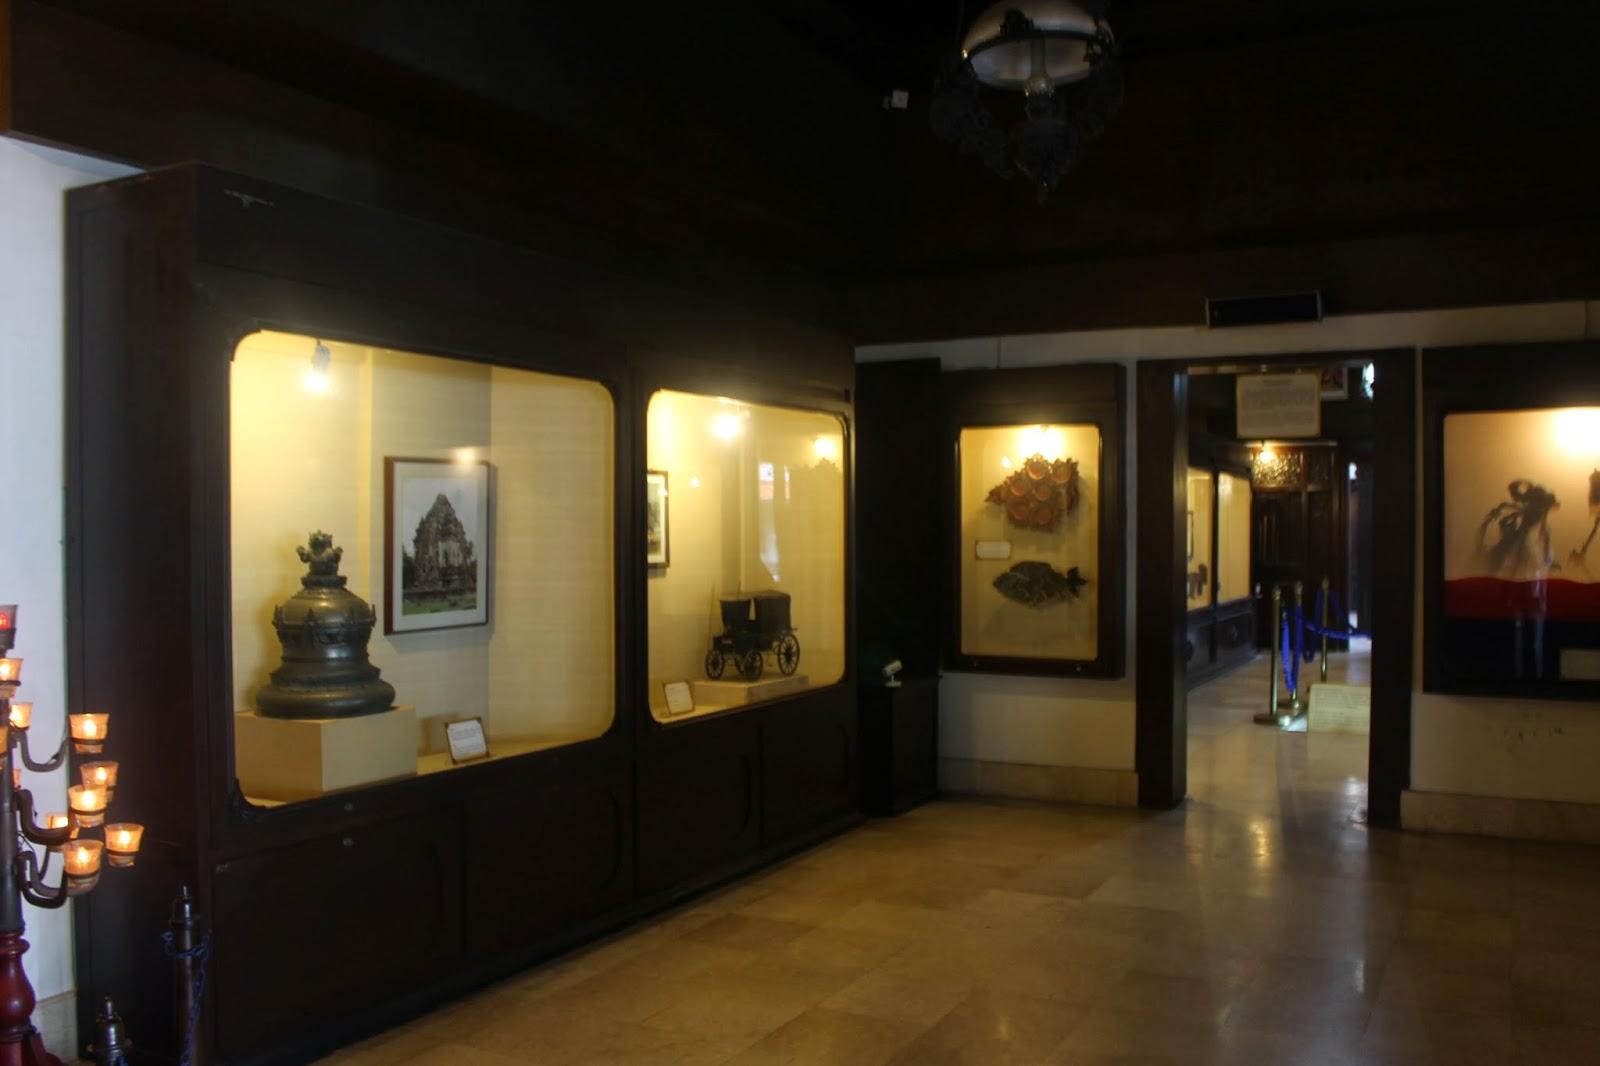 Jogja Fact Museum Sonobudoyo Swaragama 101 7 Fm Unit Galeri